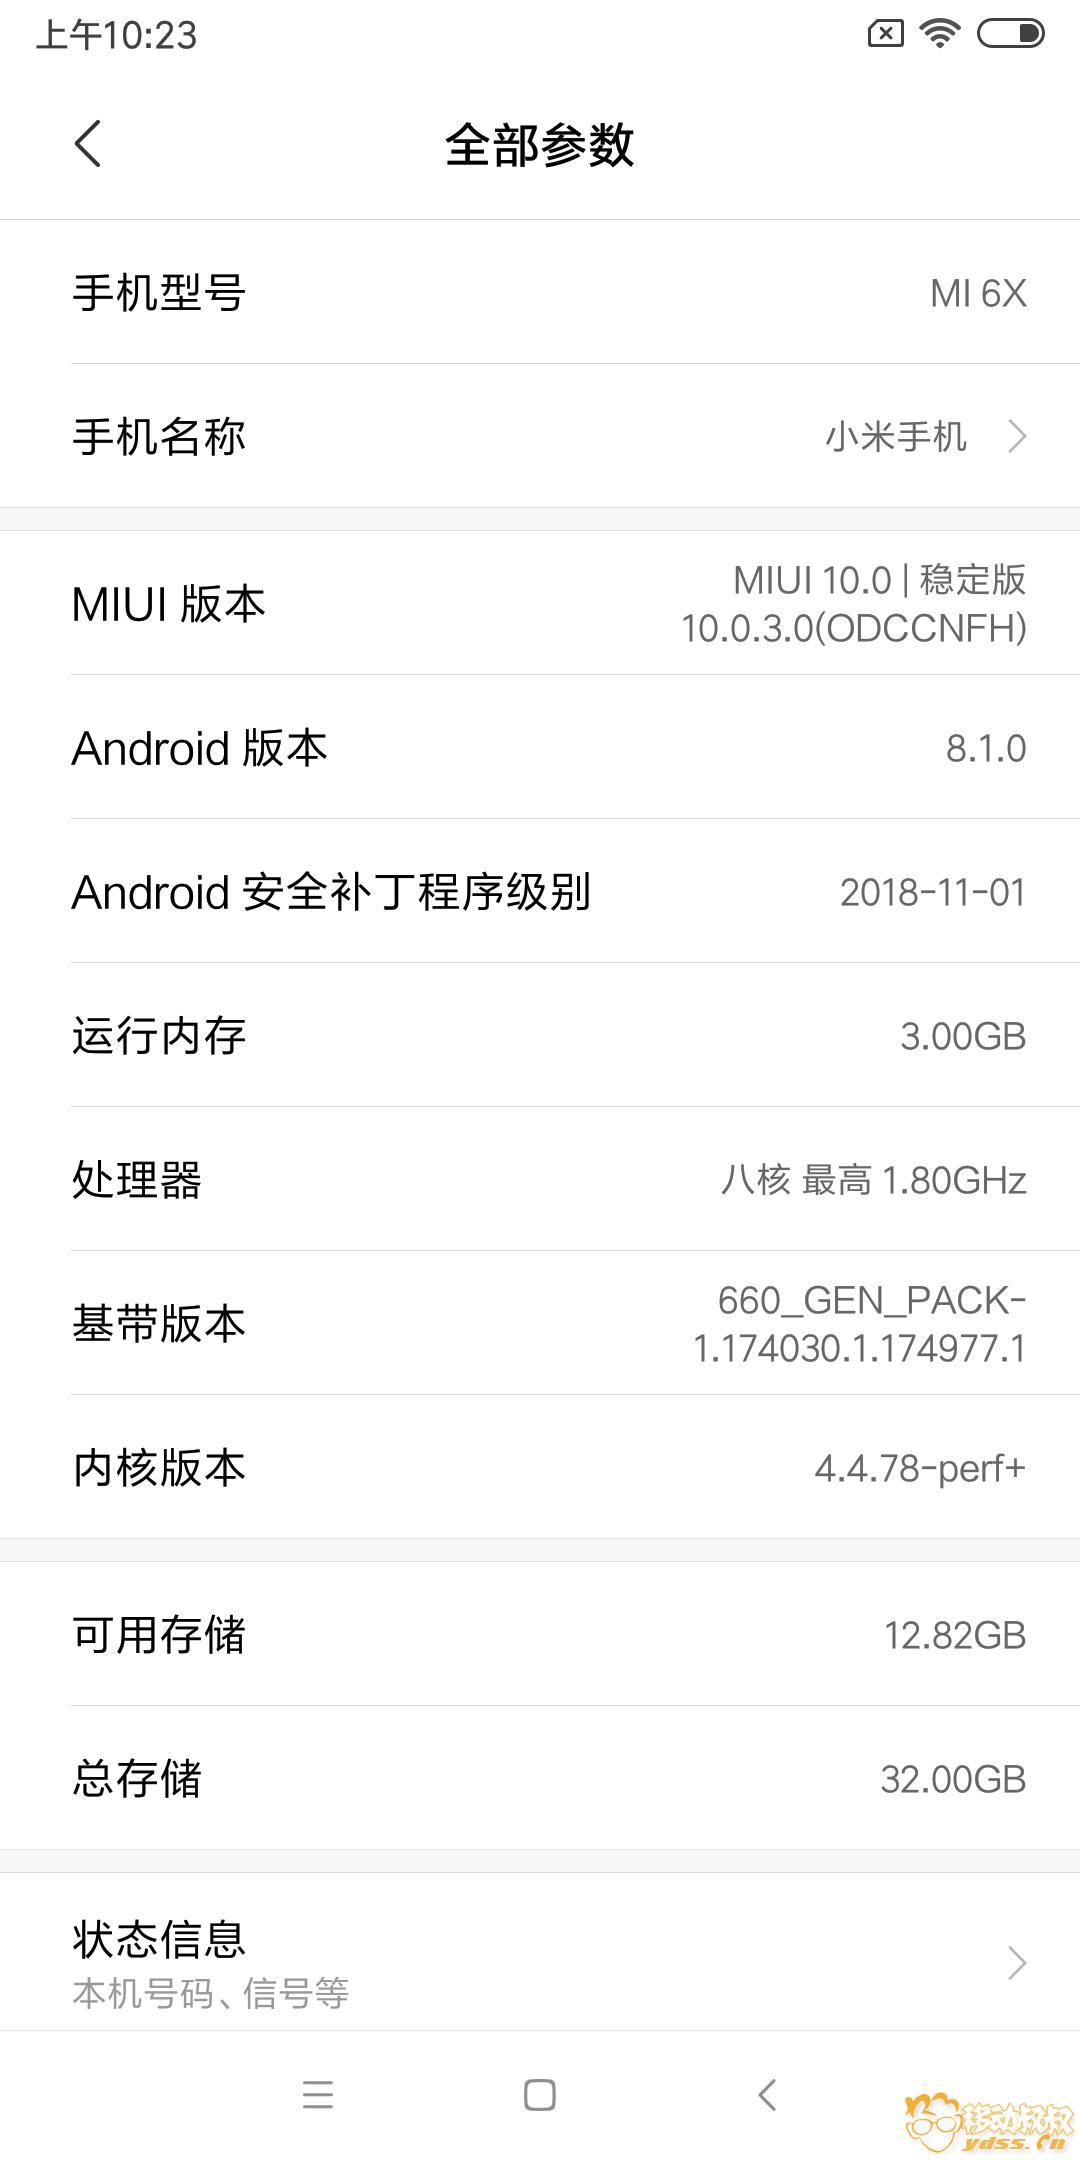 Screenshot_2018-12-06-10-23-44-849_com.android.settings.png